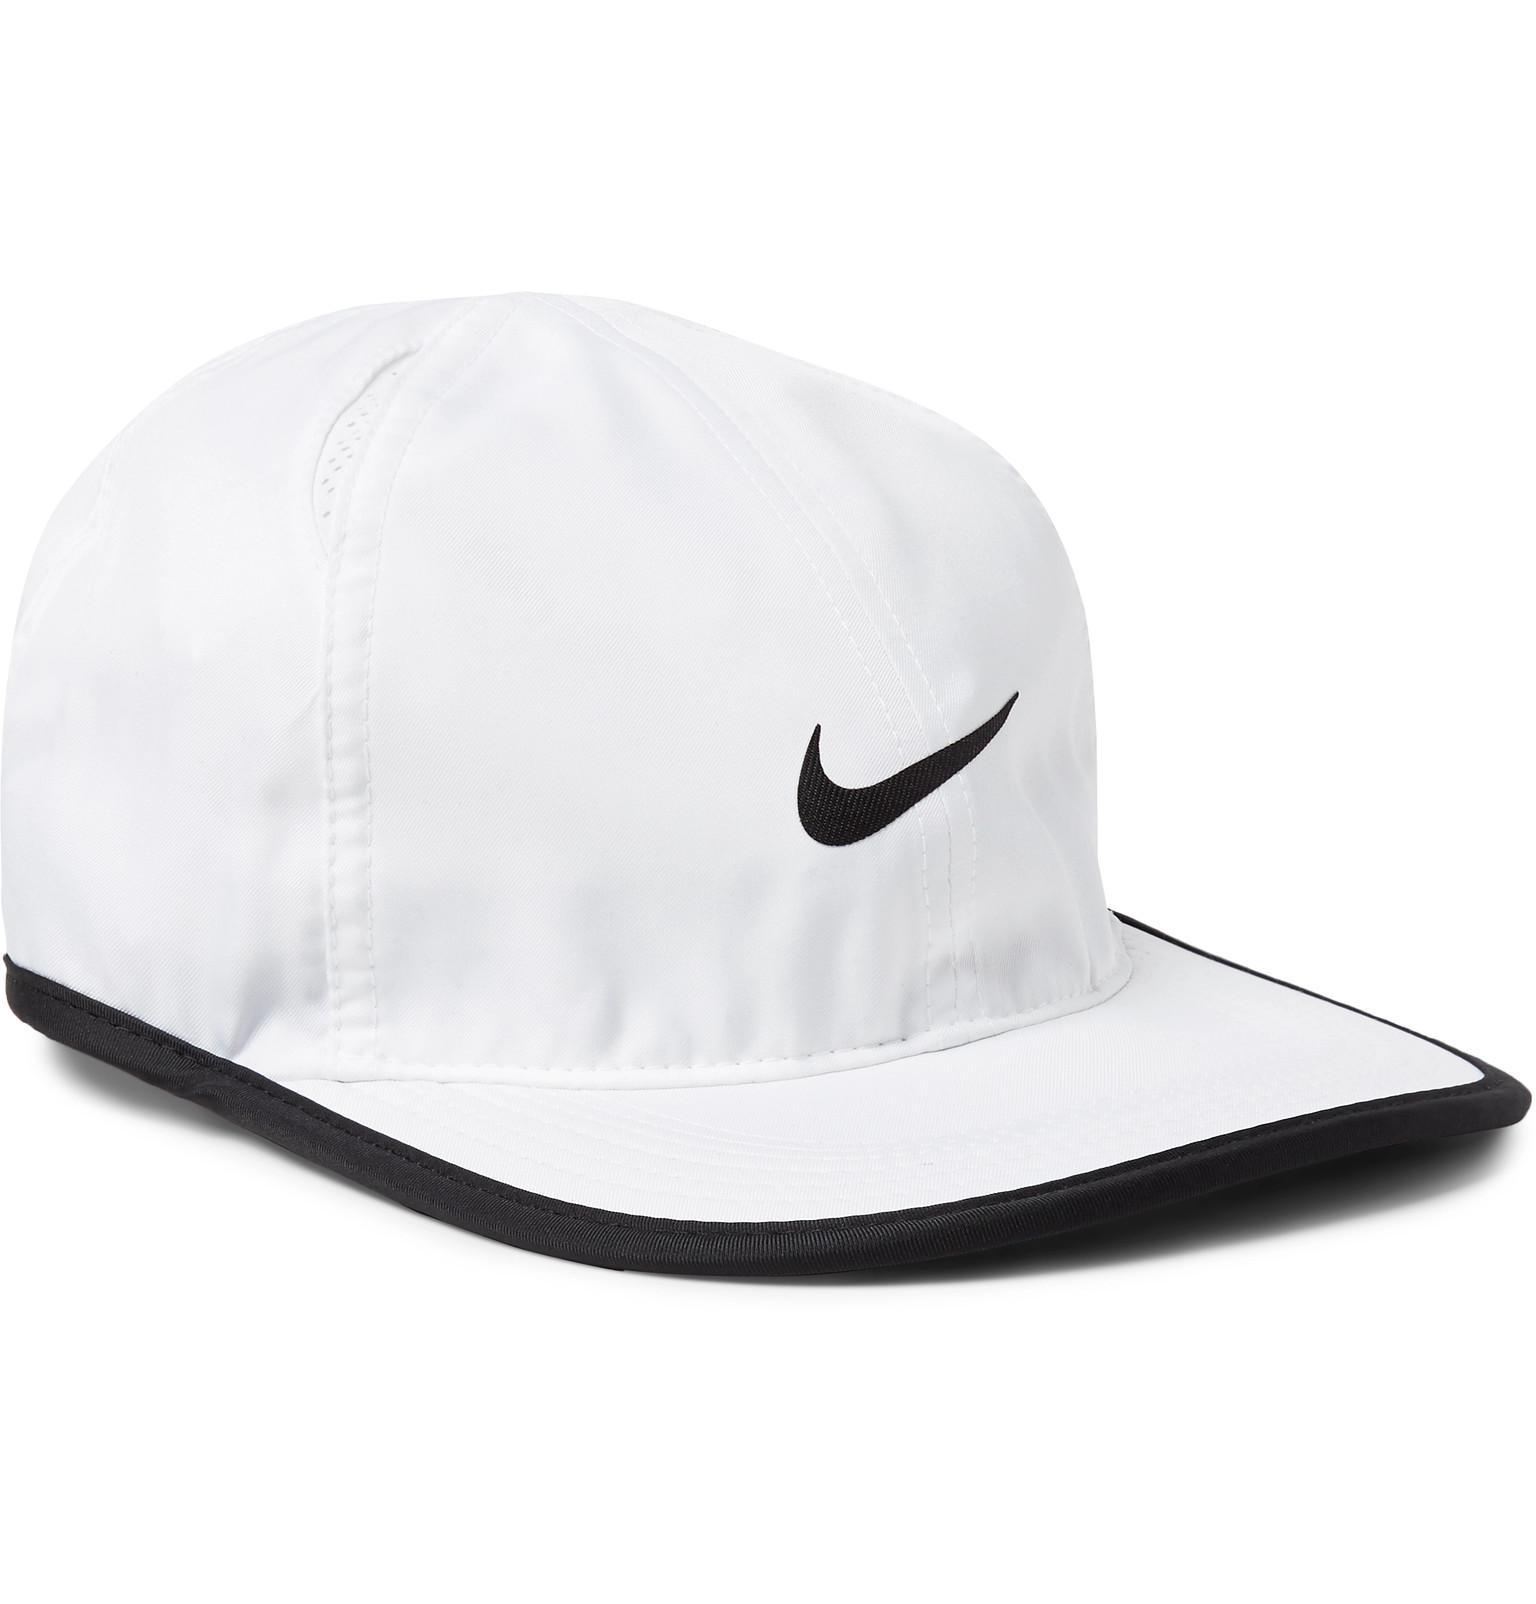 Aerobill Dri-fit Cap De Tennis Nike r65G41snL